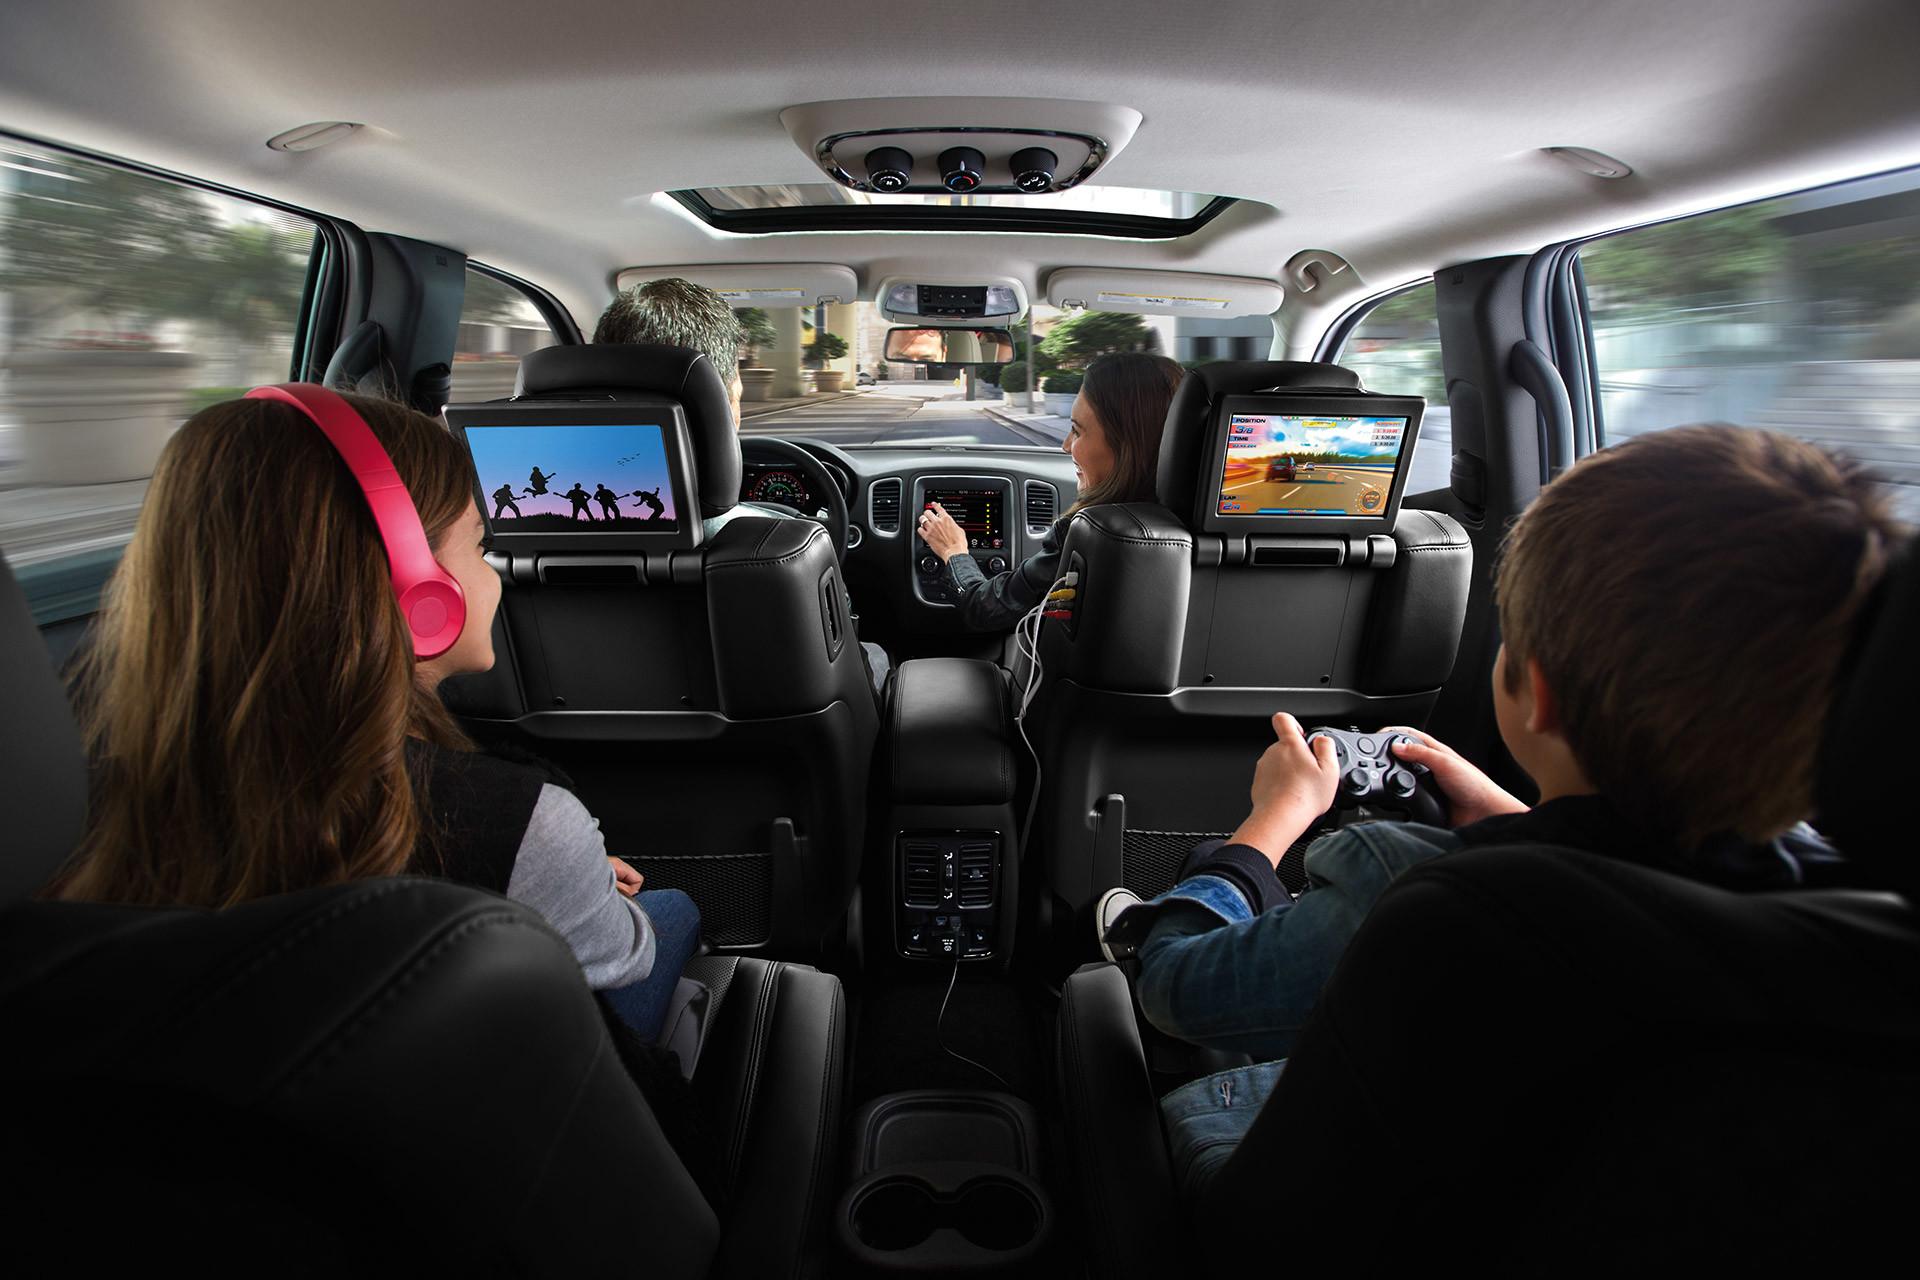 2020 Dodge Durango 7 Seater Suv Interior Gallery Dodge Canada